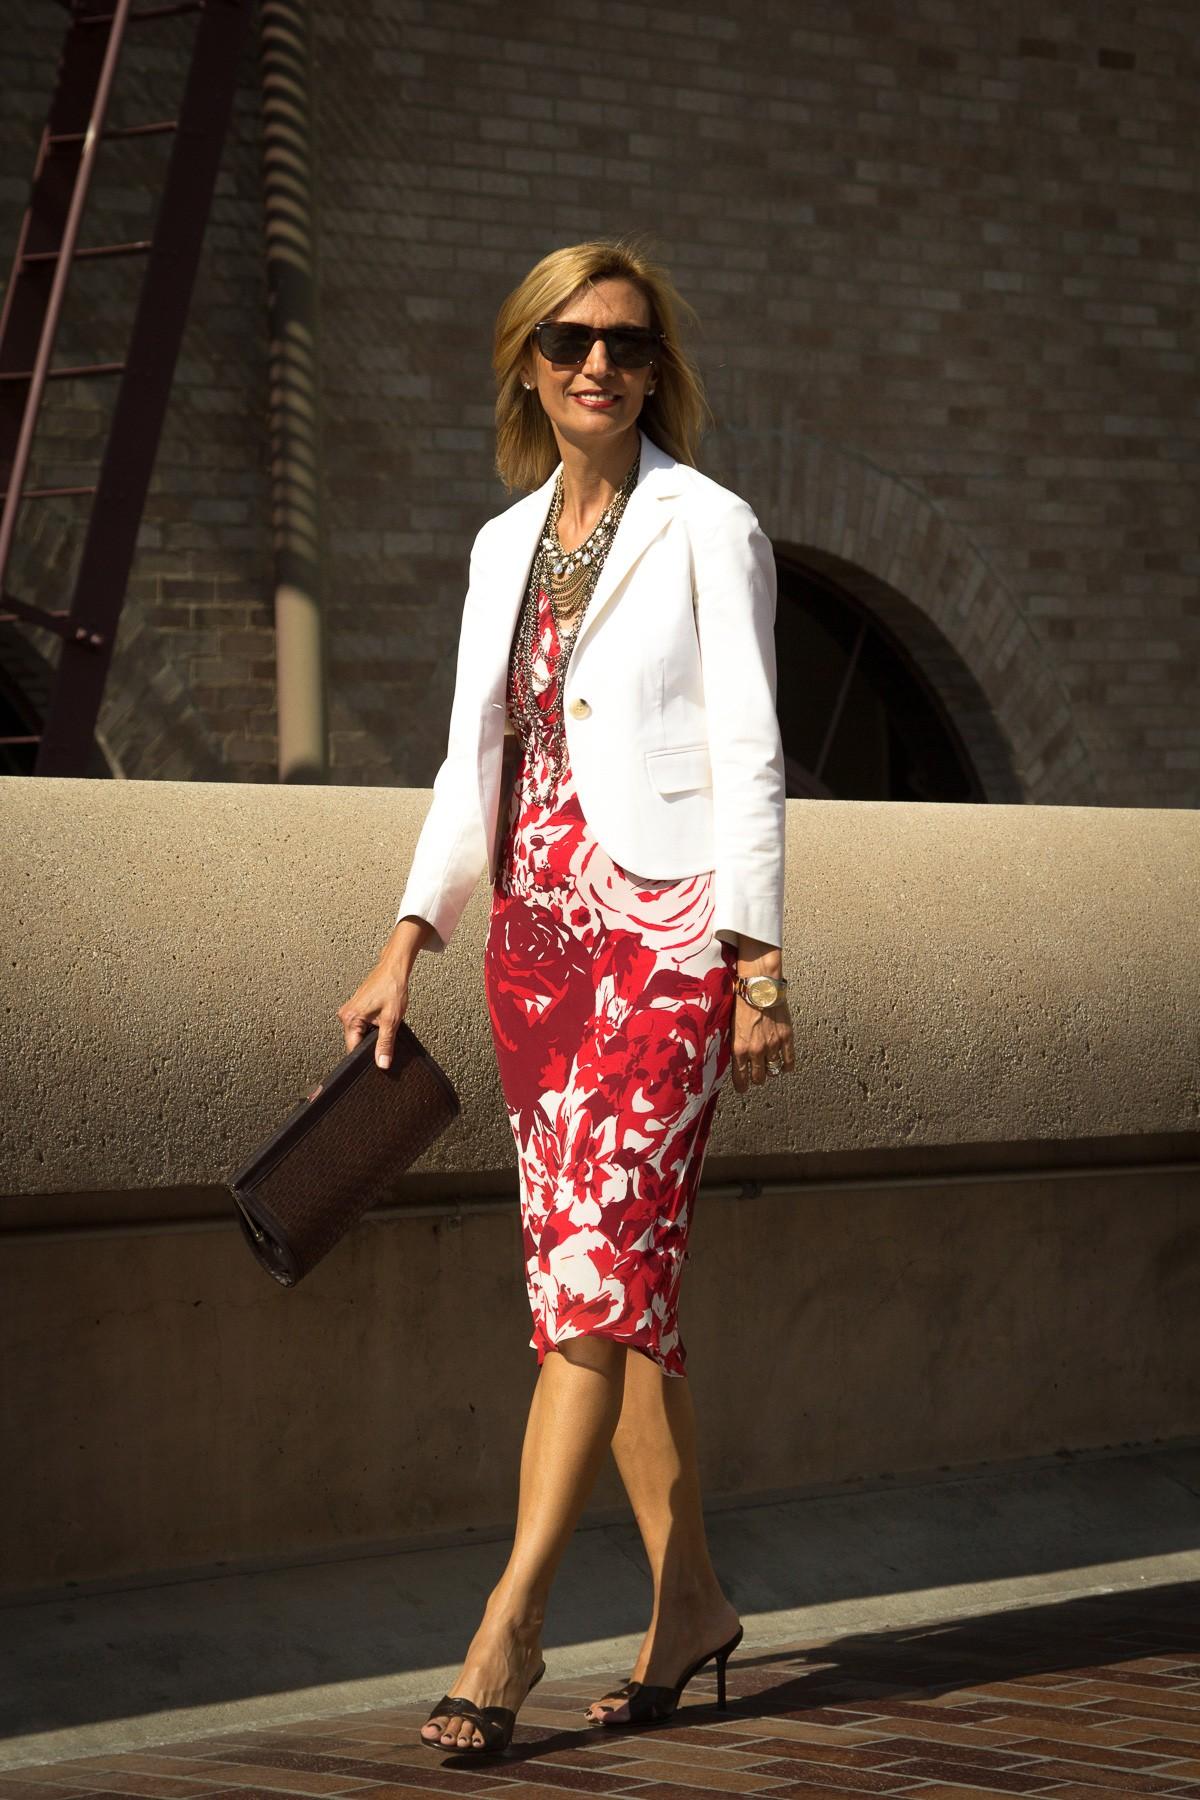 Wearing-My-Shrunken-Blazer-As-A-Cardigan-www.jacketsociety.com-3